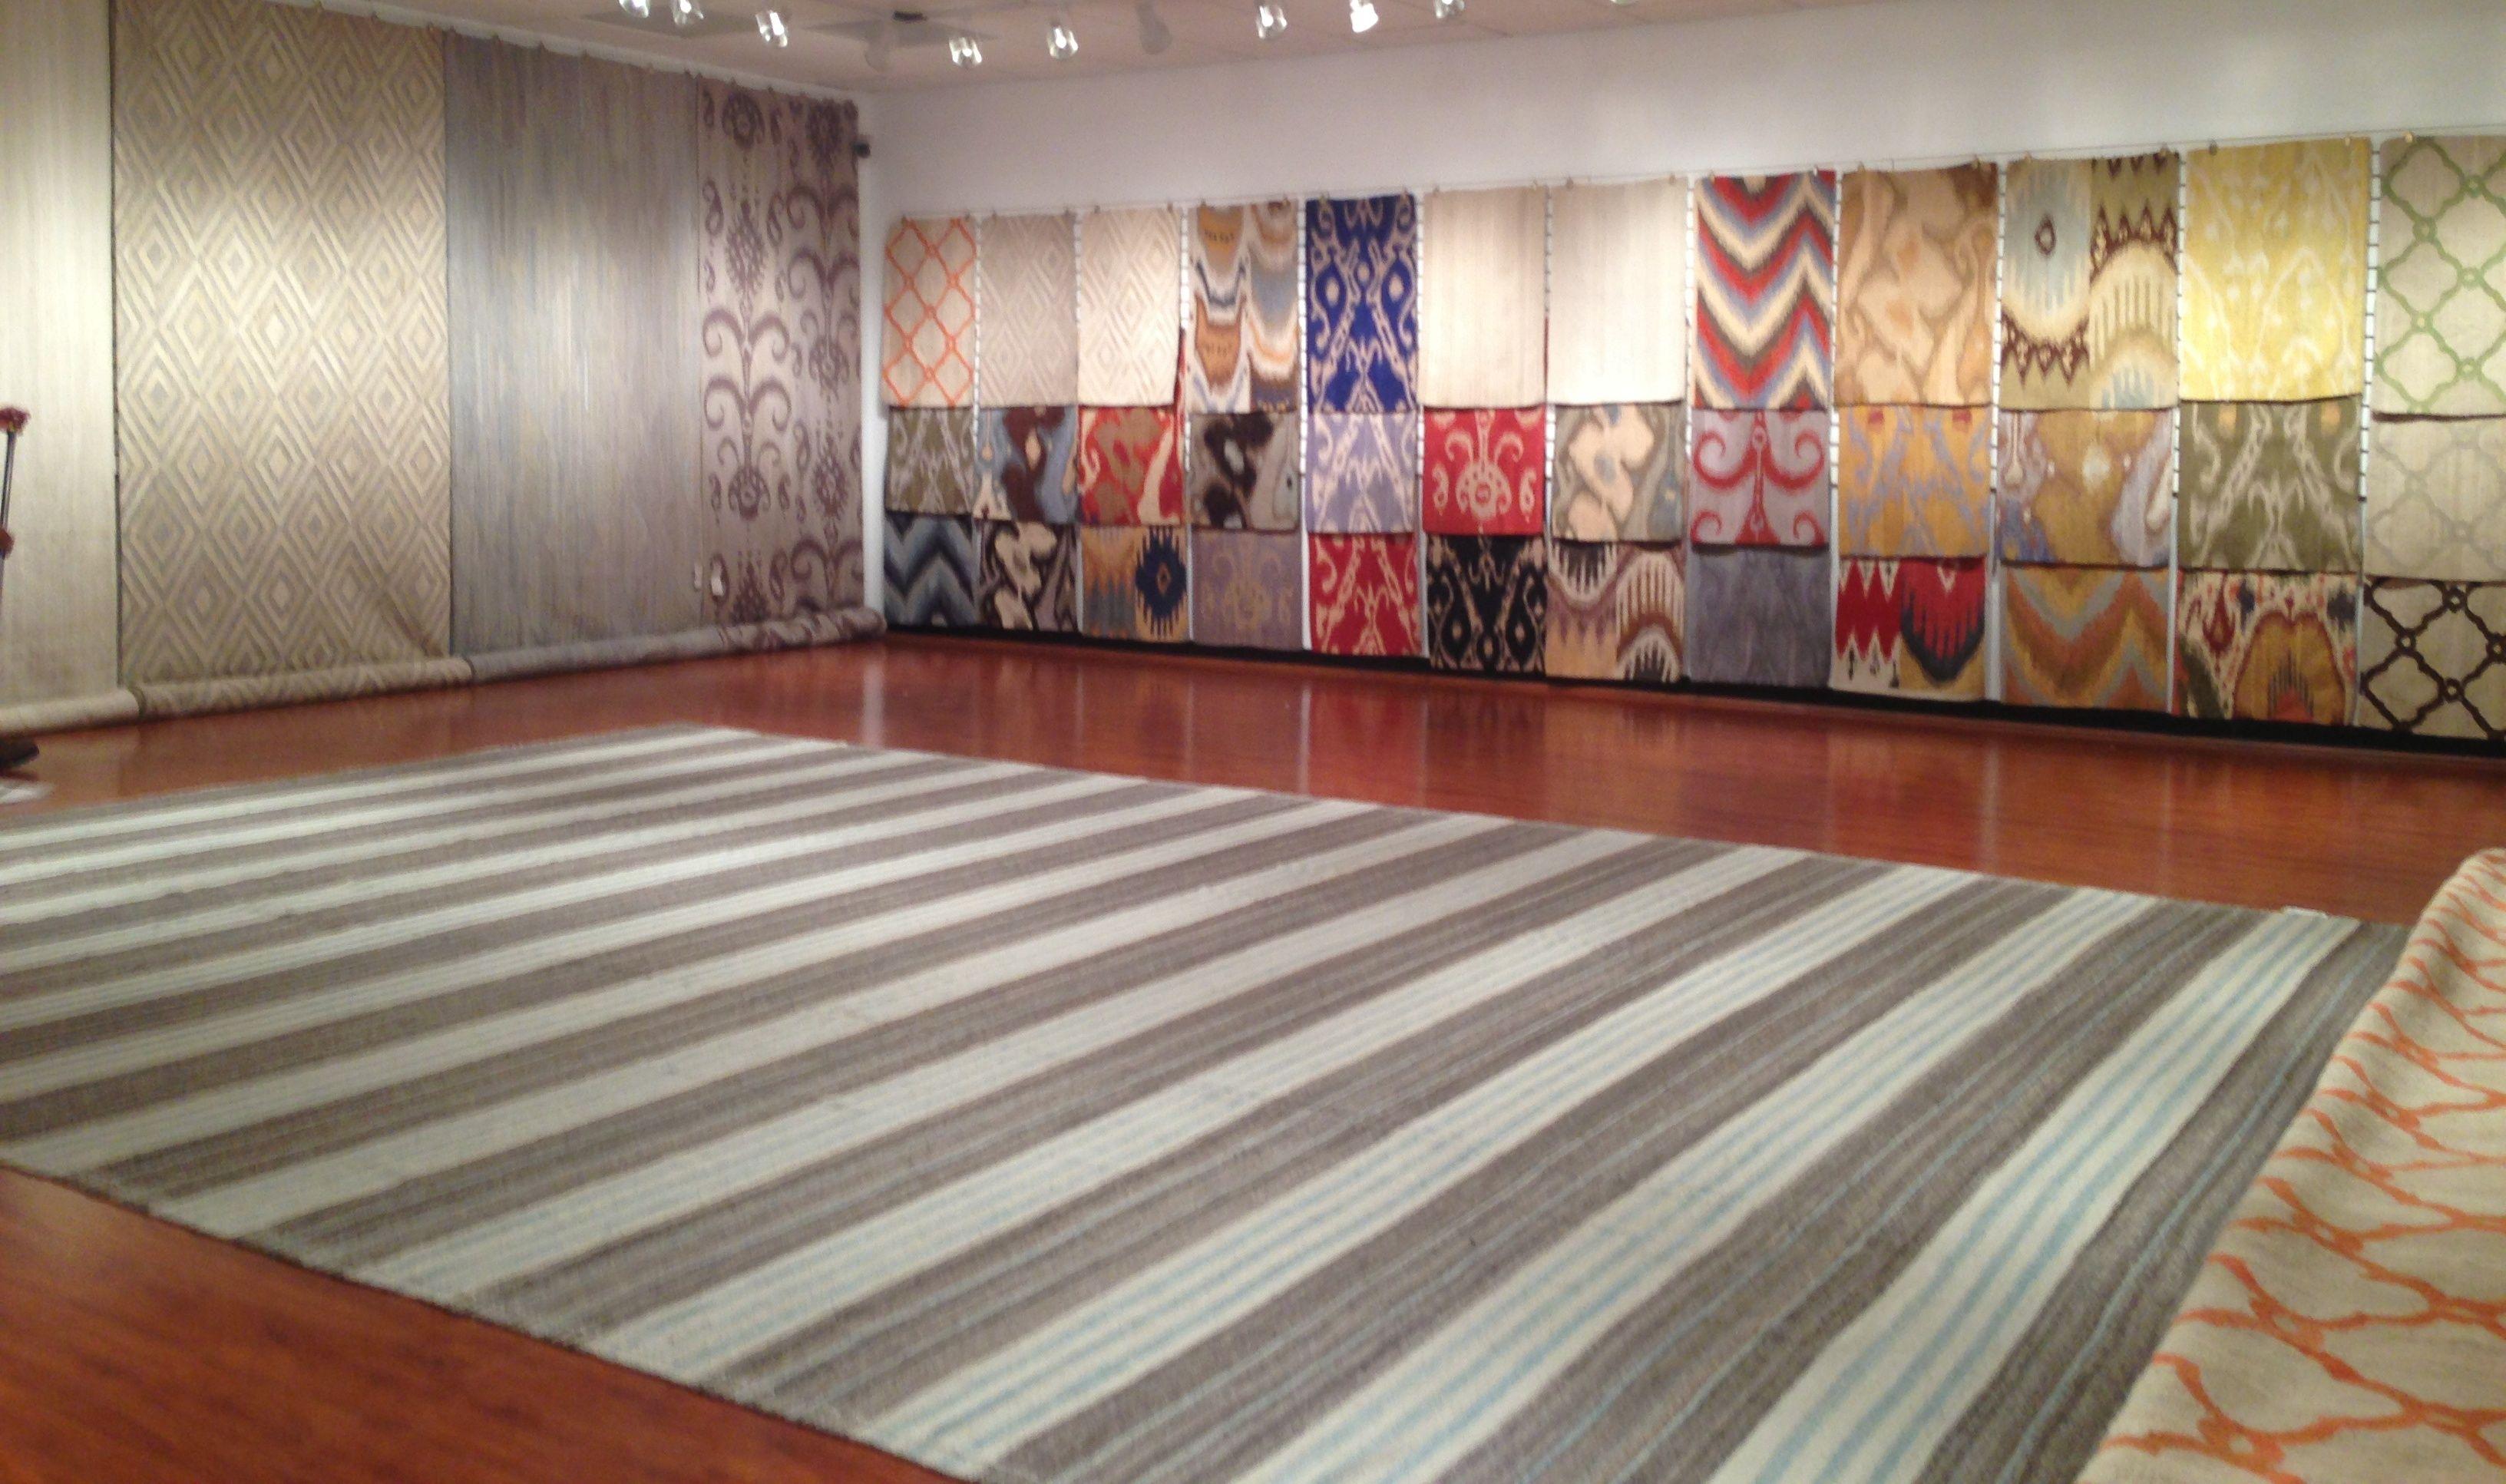 modern flatweave rug studio at rug mart houston  rug showroom  - modern flatweave rug studio at rug mart houston